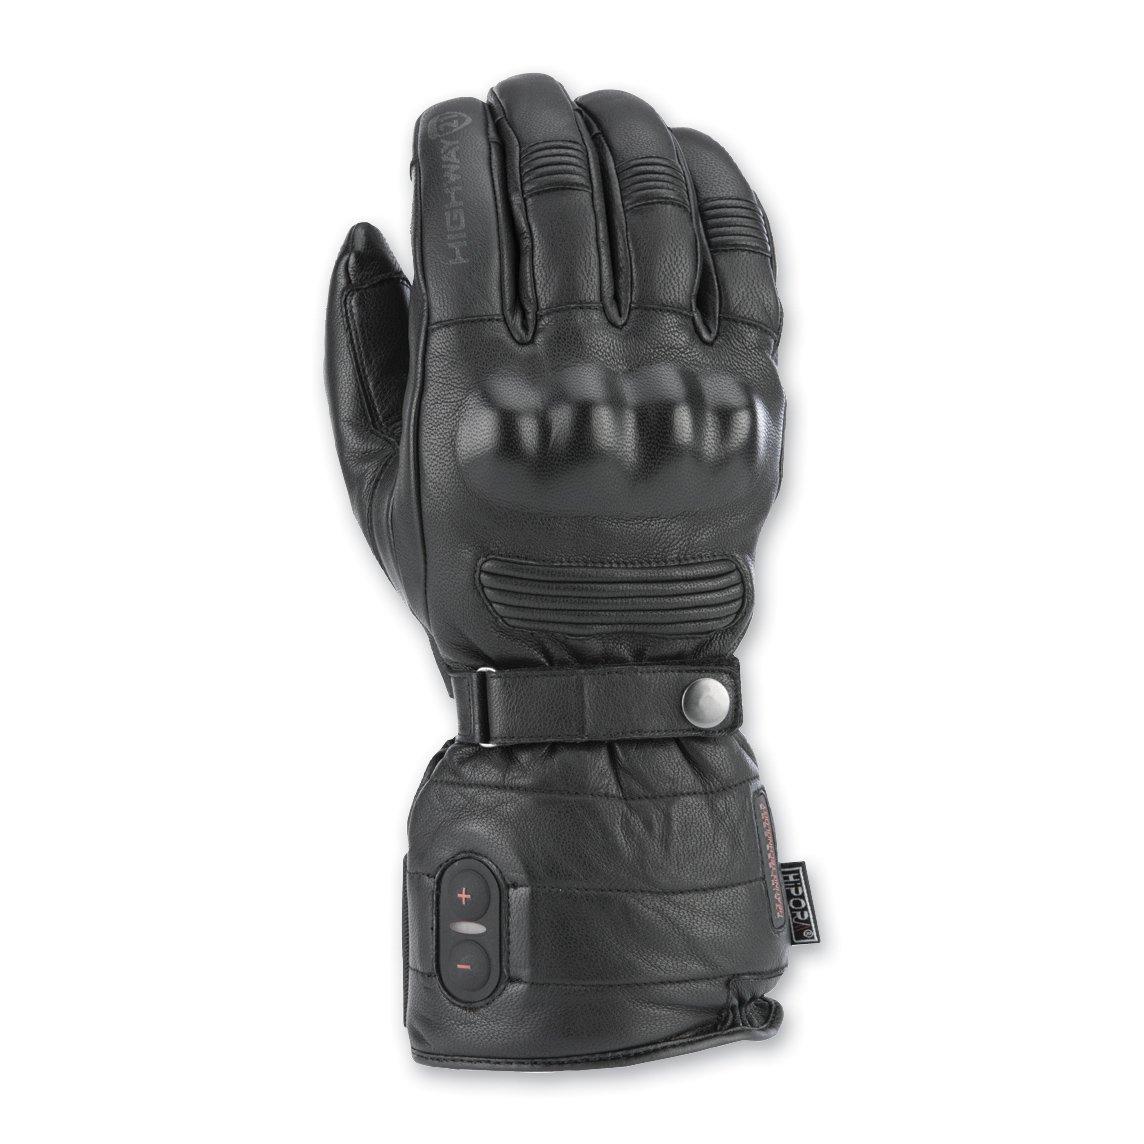 Highway 21 Unisex-Adult Radiant Glove Black XX-Large 489-00032X